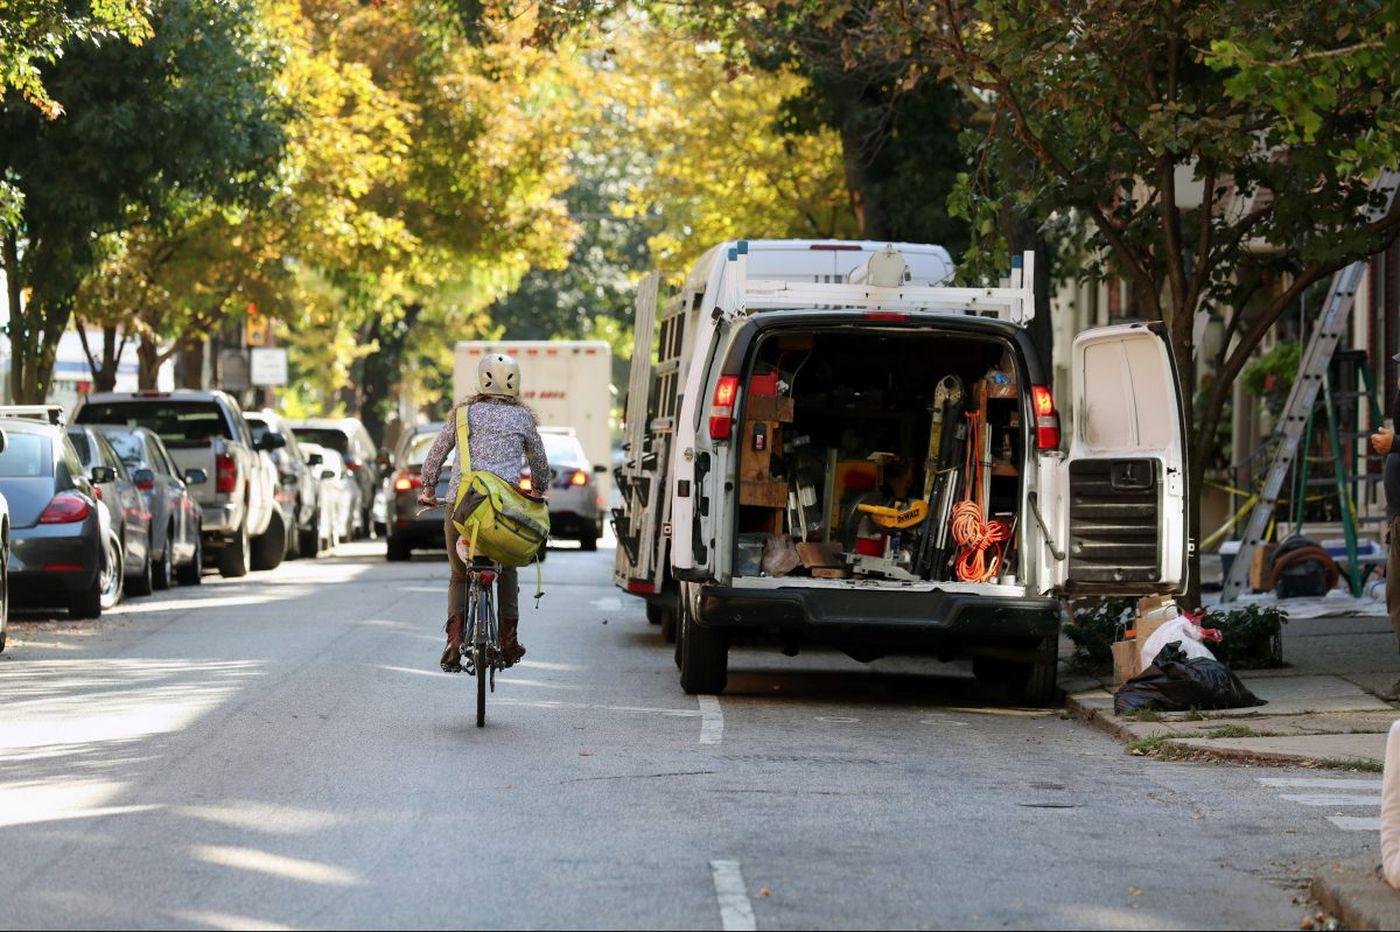 Seven ways that bike lanes benefit motorists and pedestrians